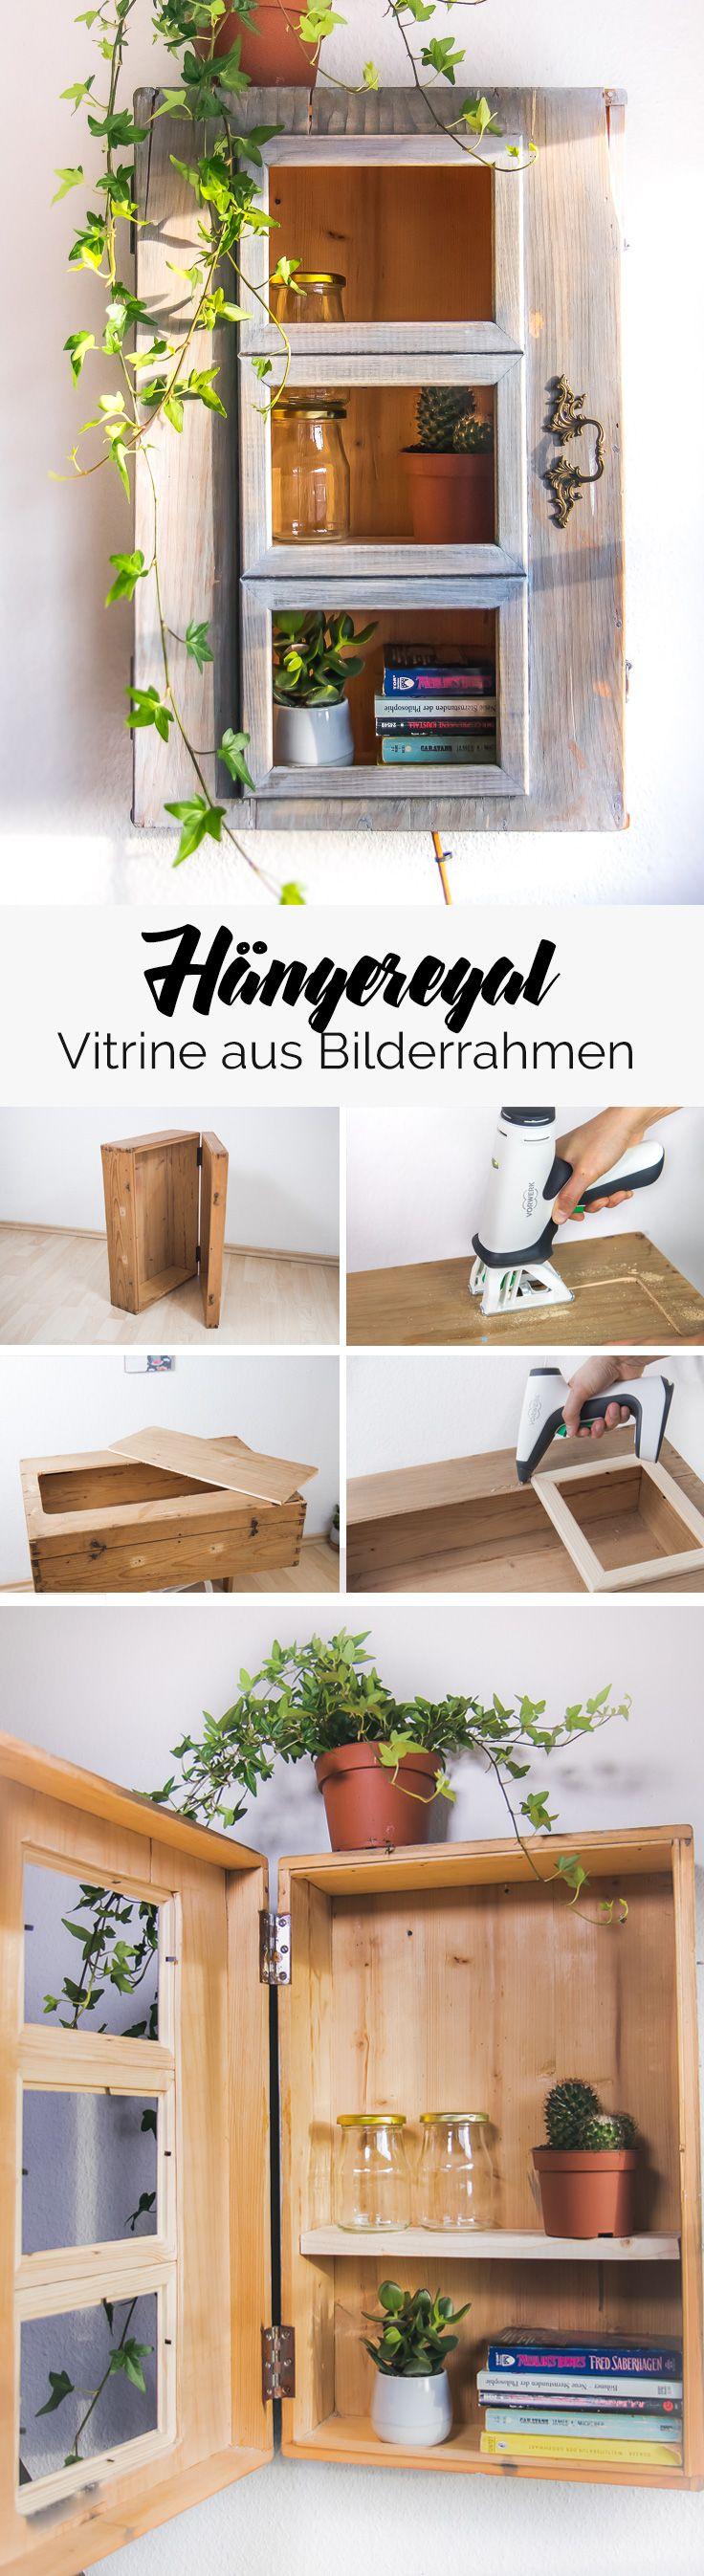 DIY Vitrinenschrank aus Holzmöbel & Ikea Bilderrahmen